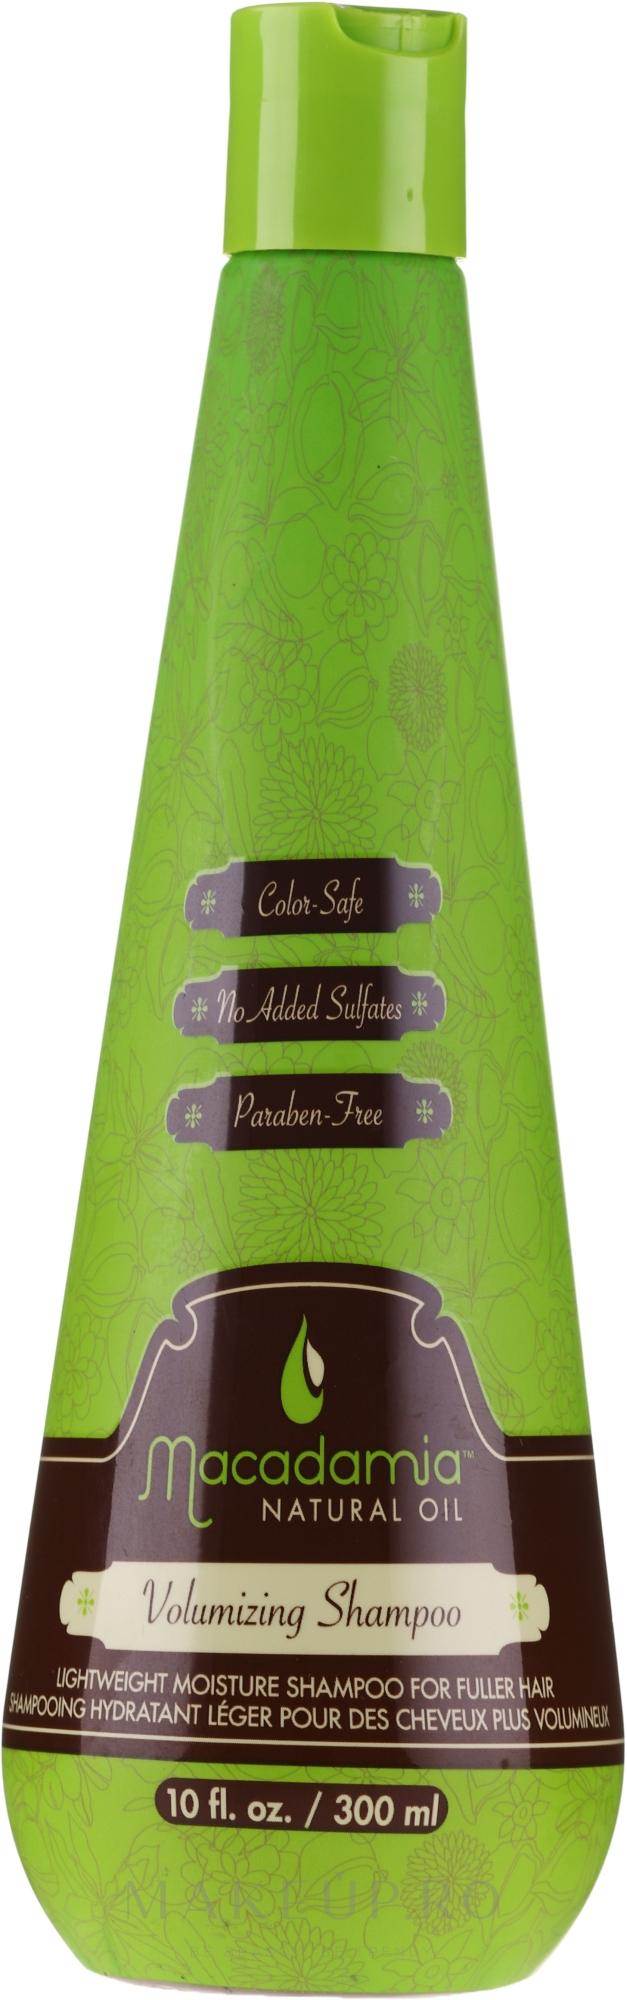 Șampon pentru volum - Macadamia Natural Oil Volumizing Shampoo — Imagine 300 ml